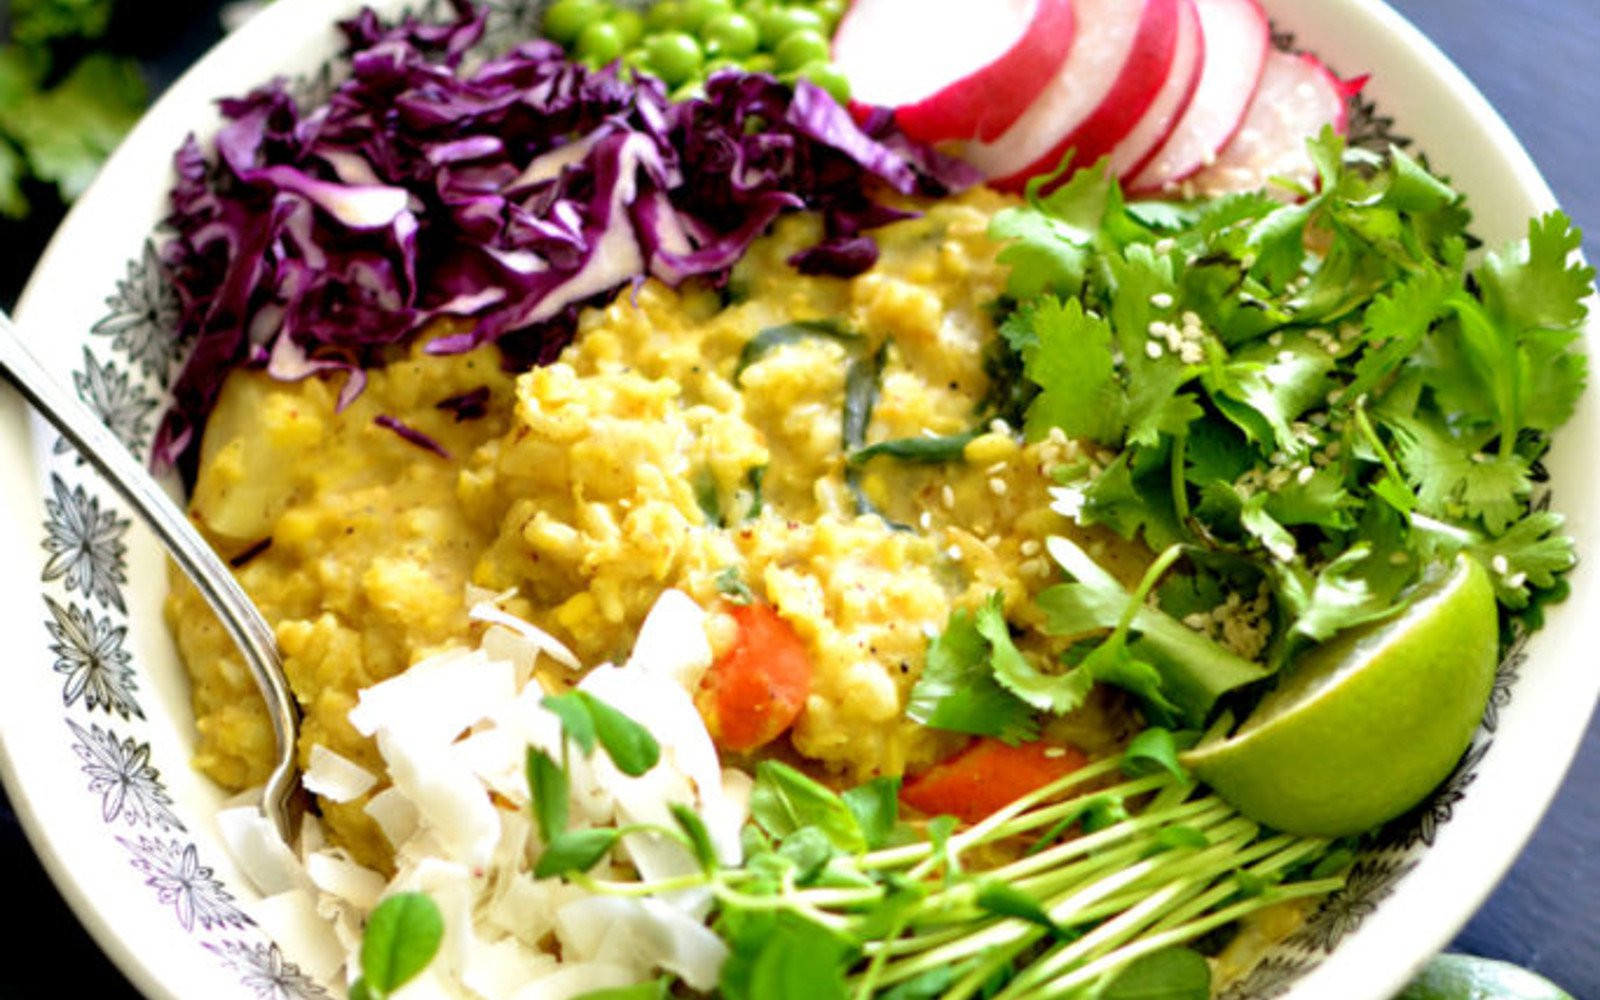 Summer Vegan Recipes  Summer Kitchari Bowl [Vegan] e Green Planet